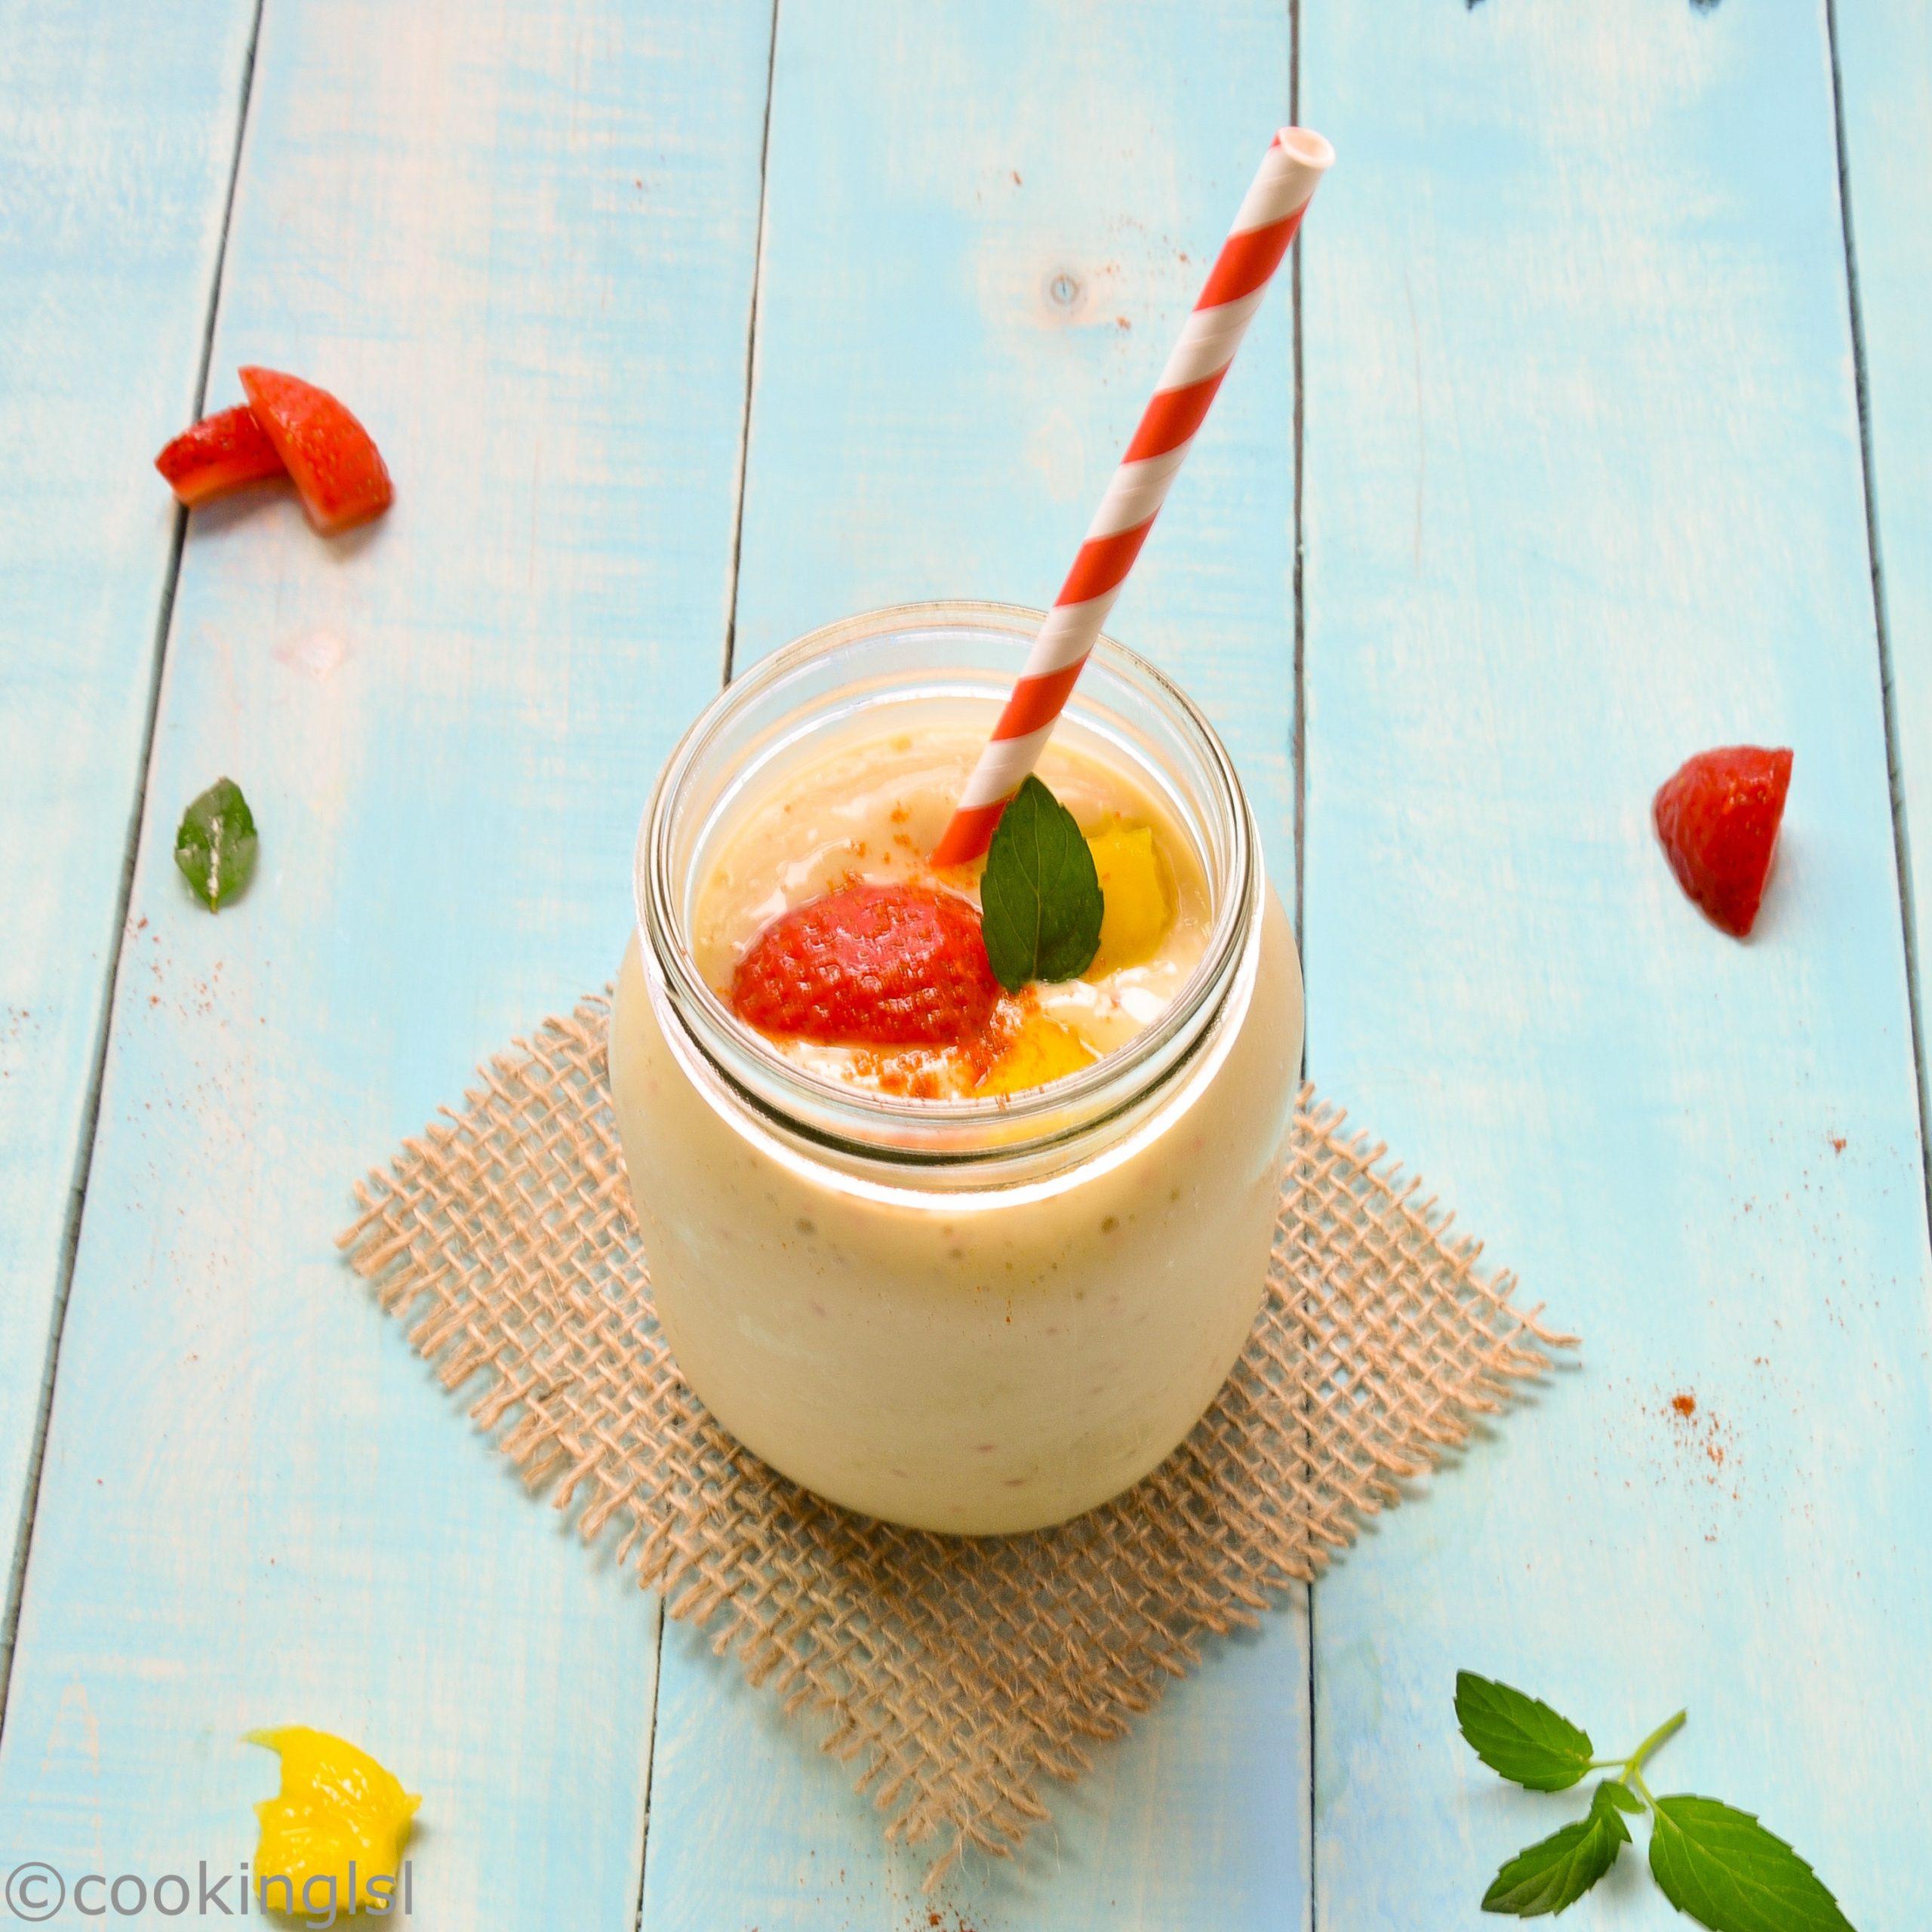 Creamy Spicy Mango, Avocado and Strawberry Smoothie